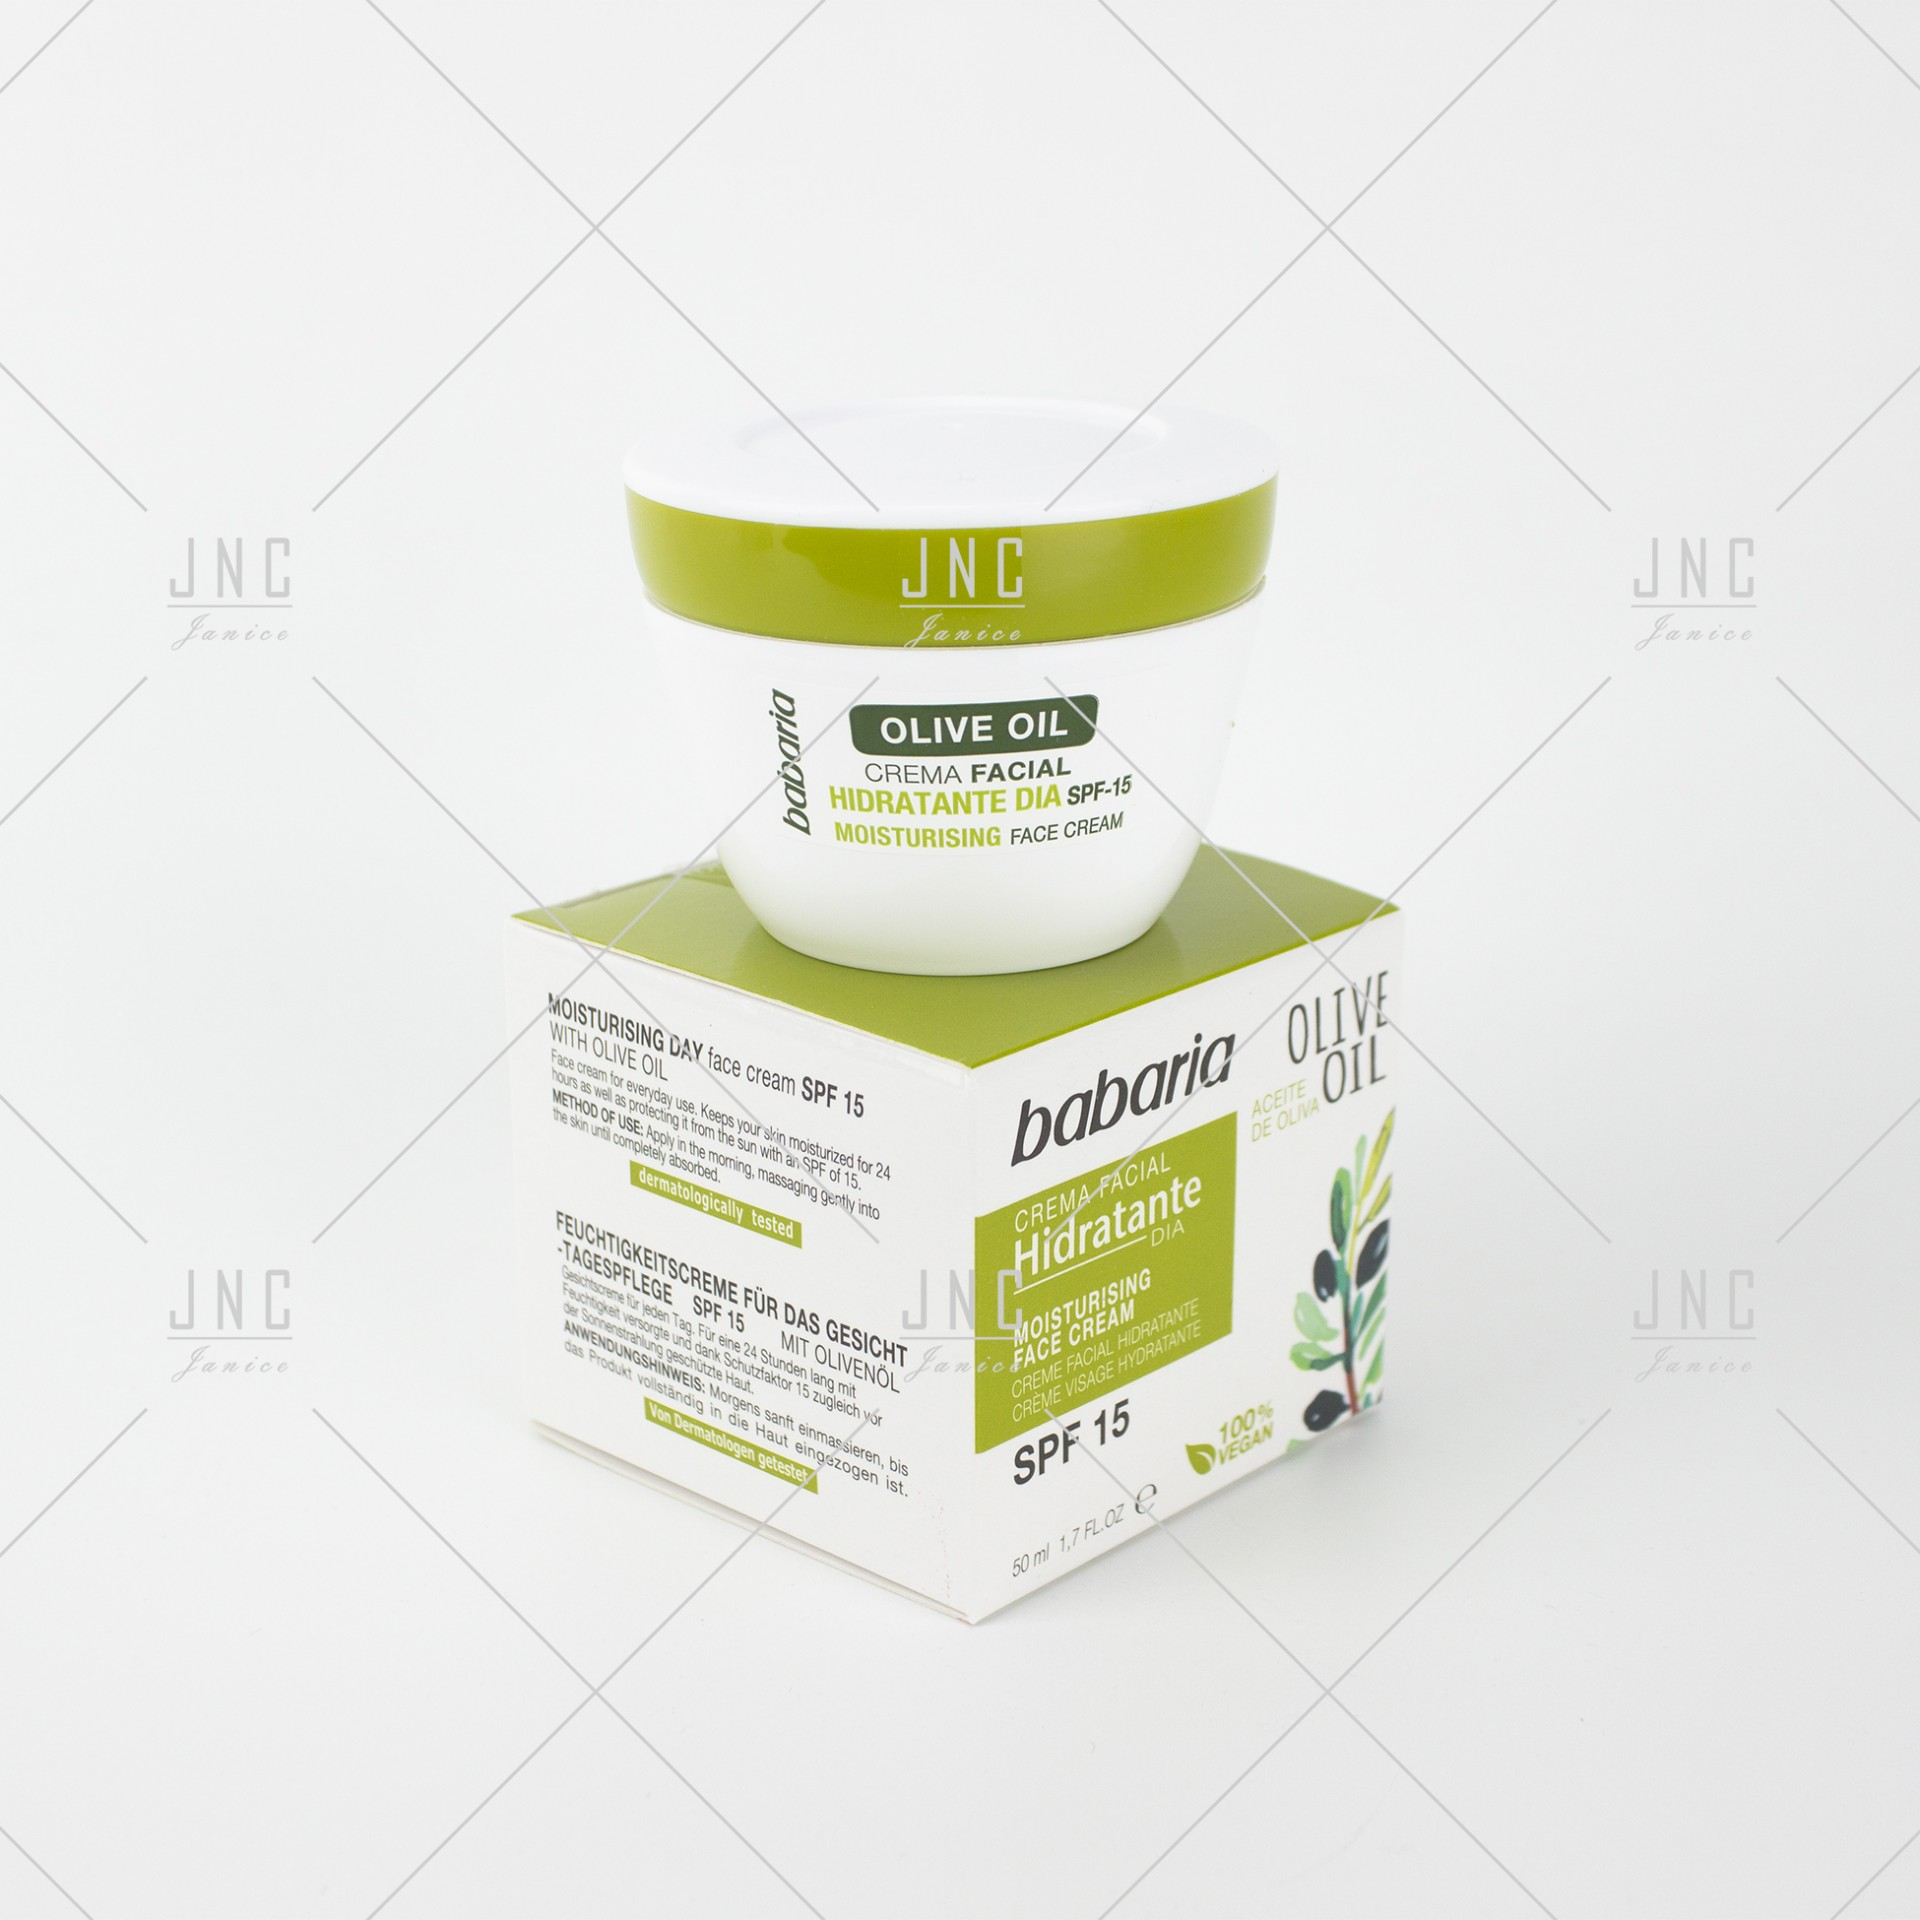 Creme Facial Azeite Oliva   Ref.98765